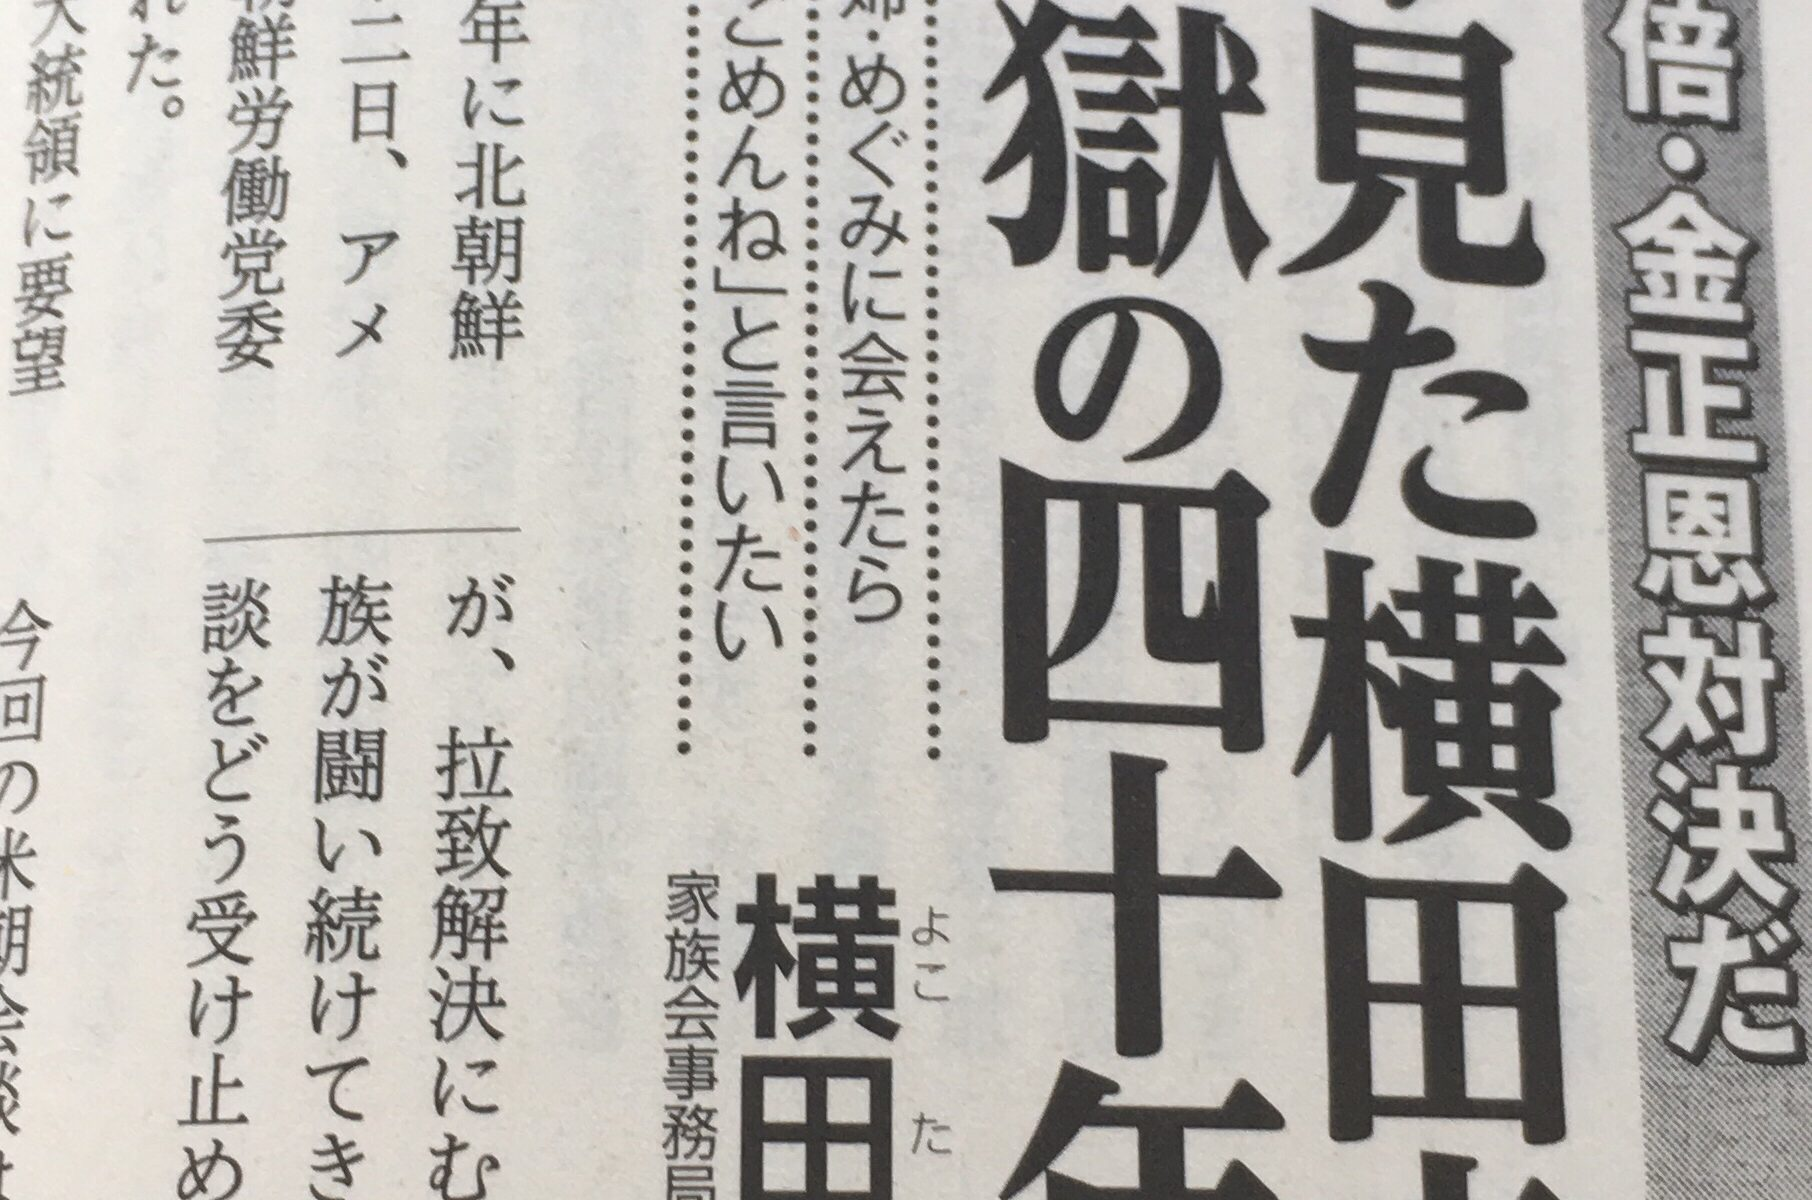 Takuya Yokota Wants To Say Sorry His Sister Megumi Kidnapped By NKorea